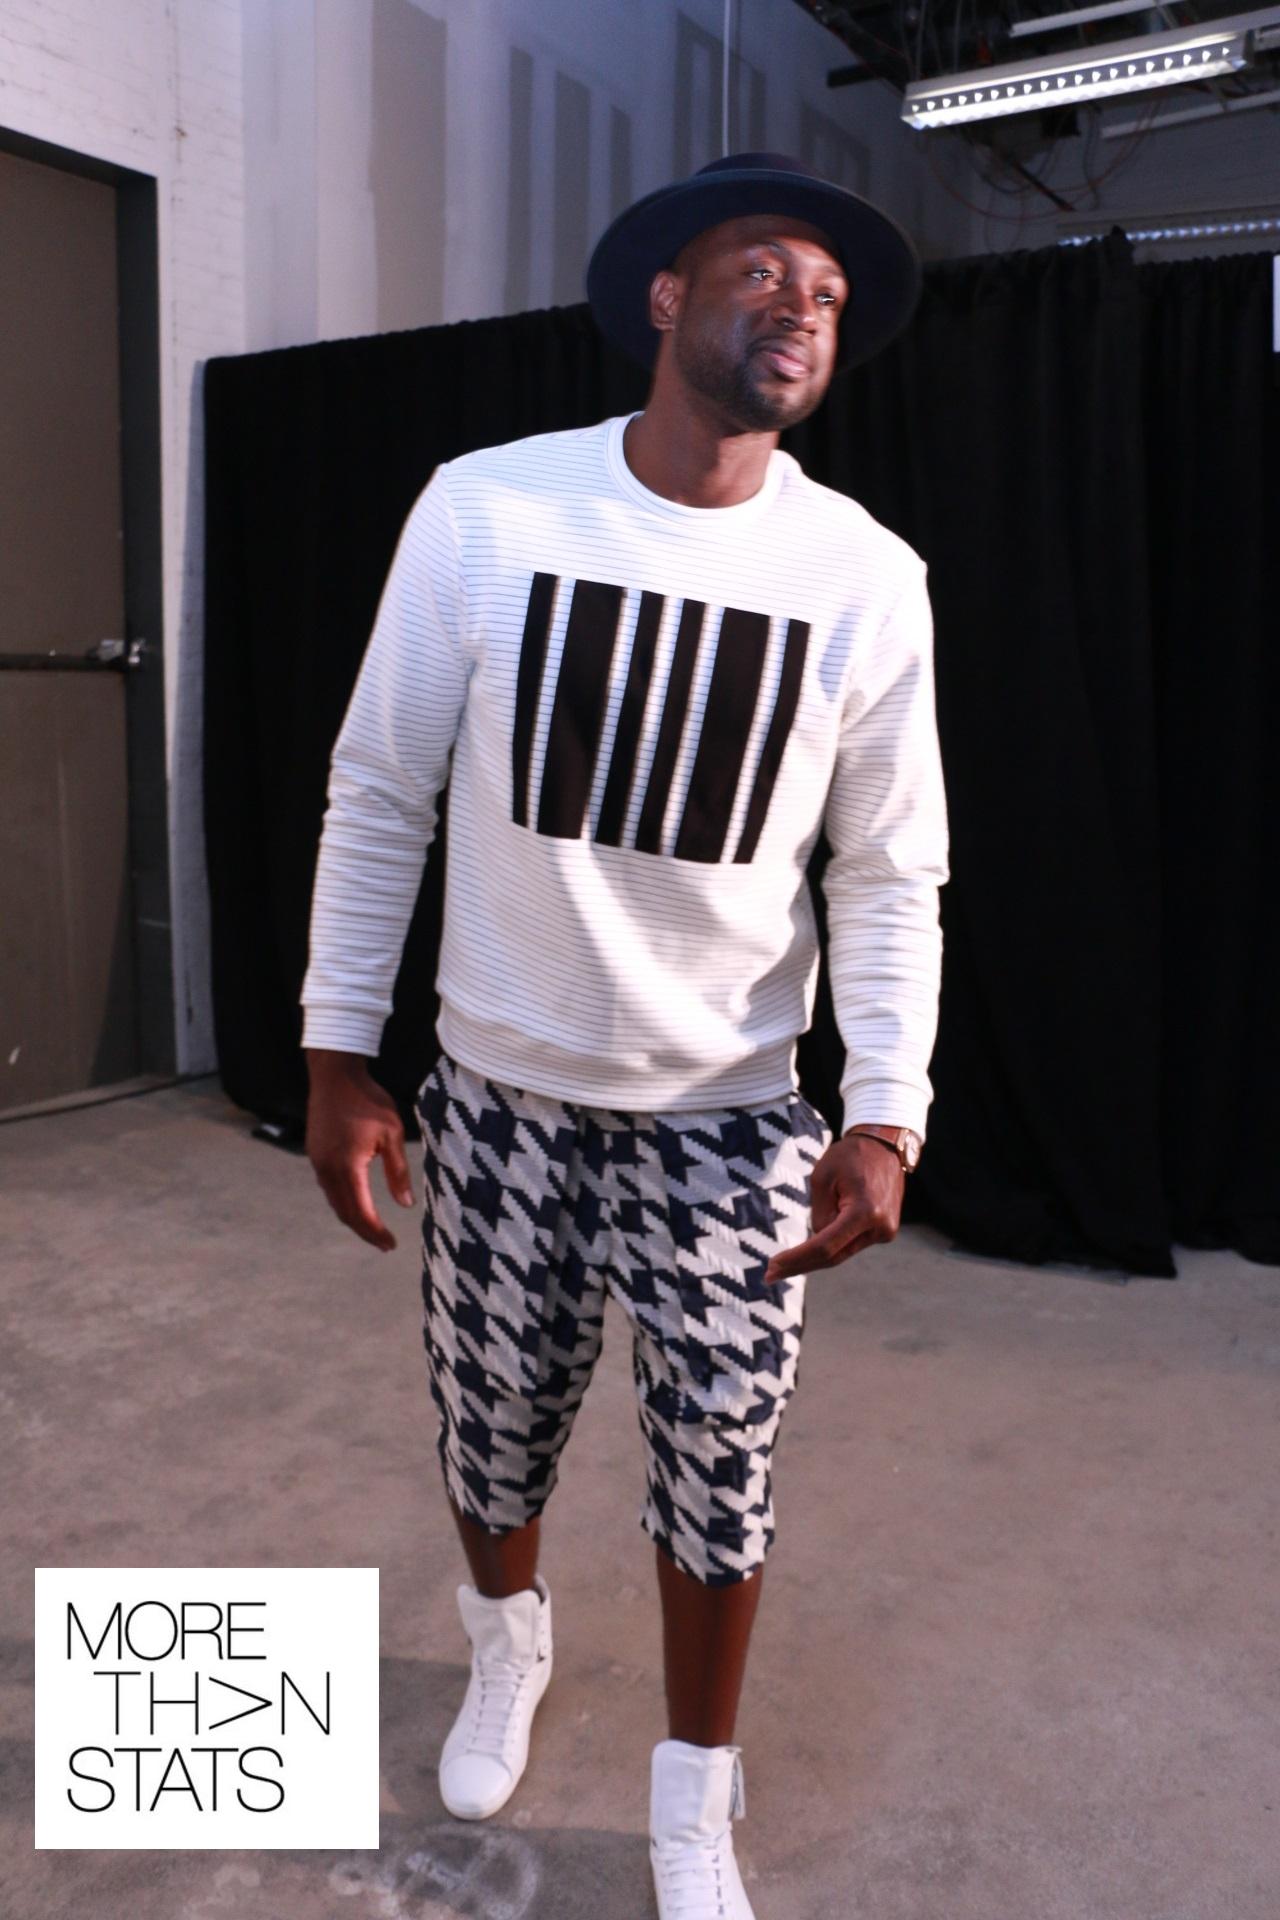 Men's Fashion Week NY: Dwyane Wade, Andre Iguodala, Victor Cruz And More